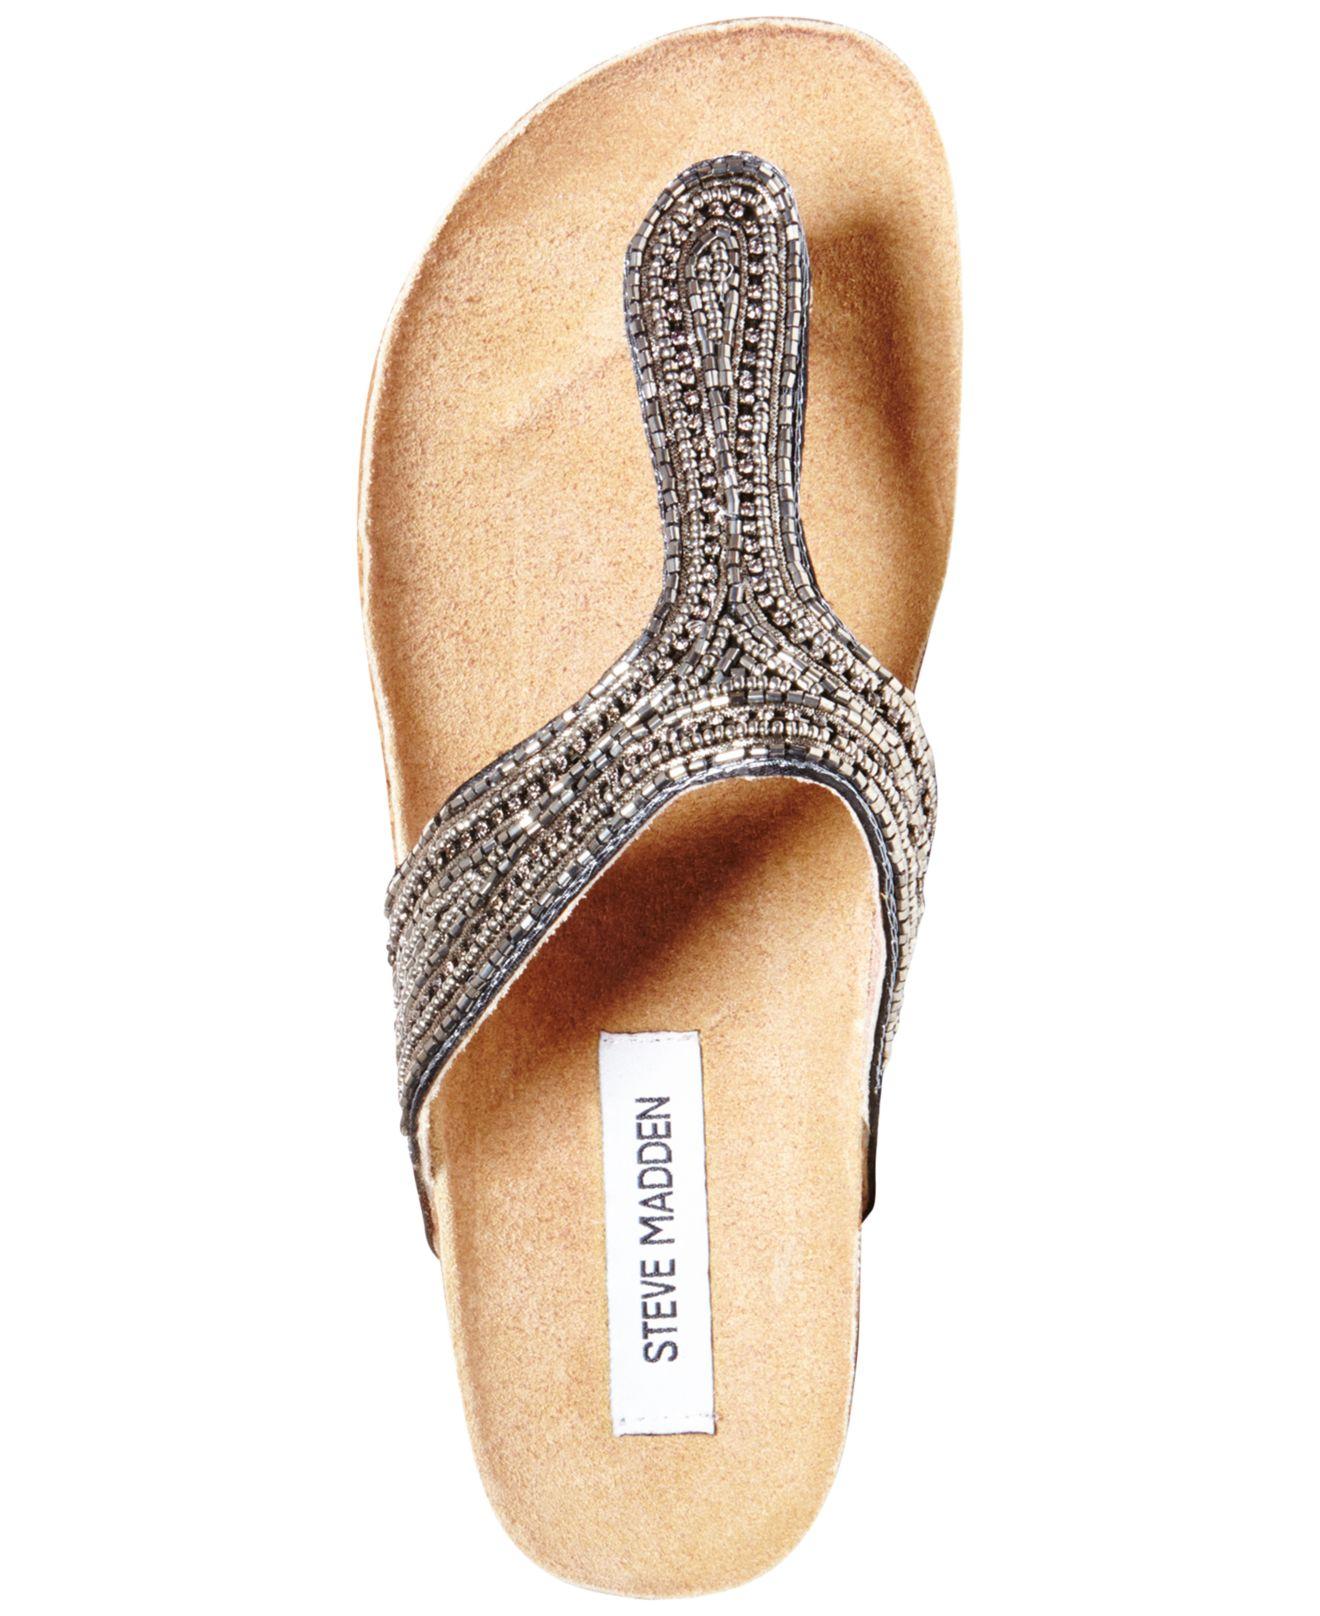 9385b1791250 Lyst - Steve Madden Radlee Rhinestone Footbed Flat Thong Sandals in Gray